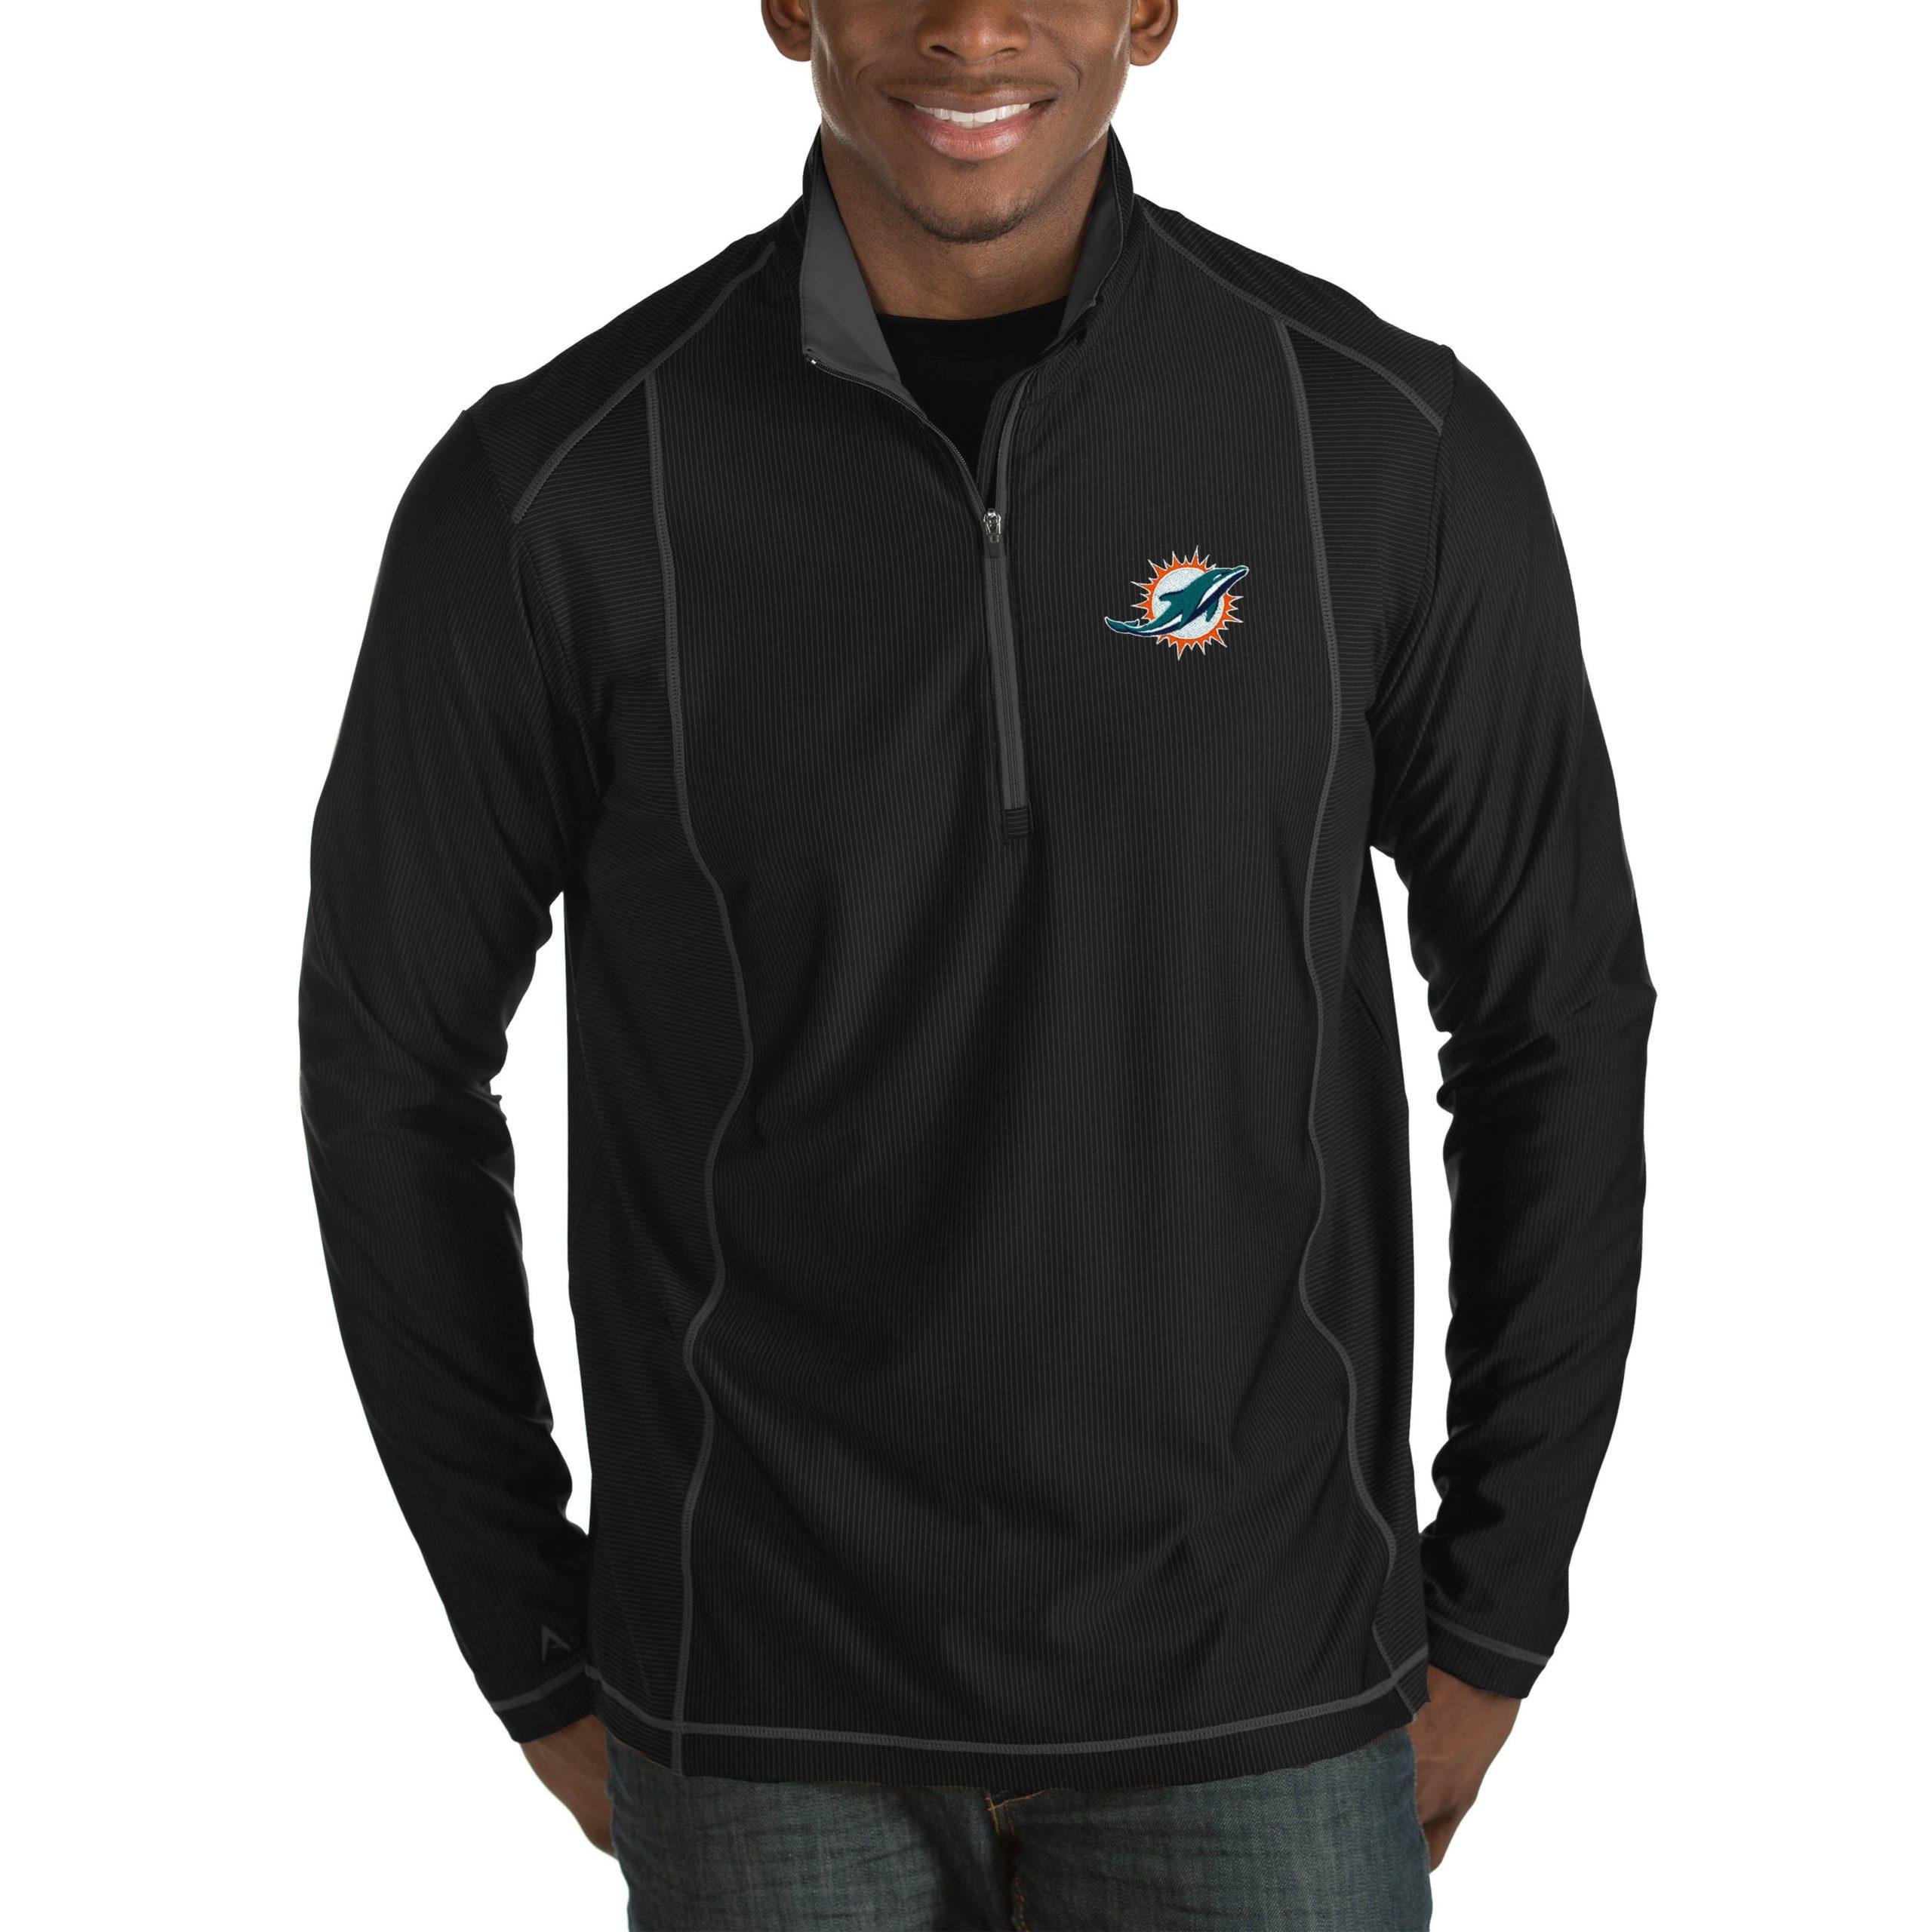 Miami Dolphins Antigua Tempo Big & Tall Half-Zip Pullover Jacket - Heather Black